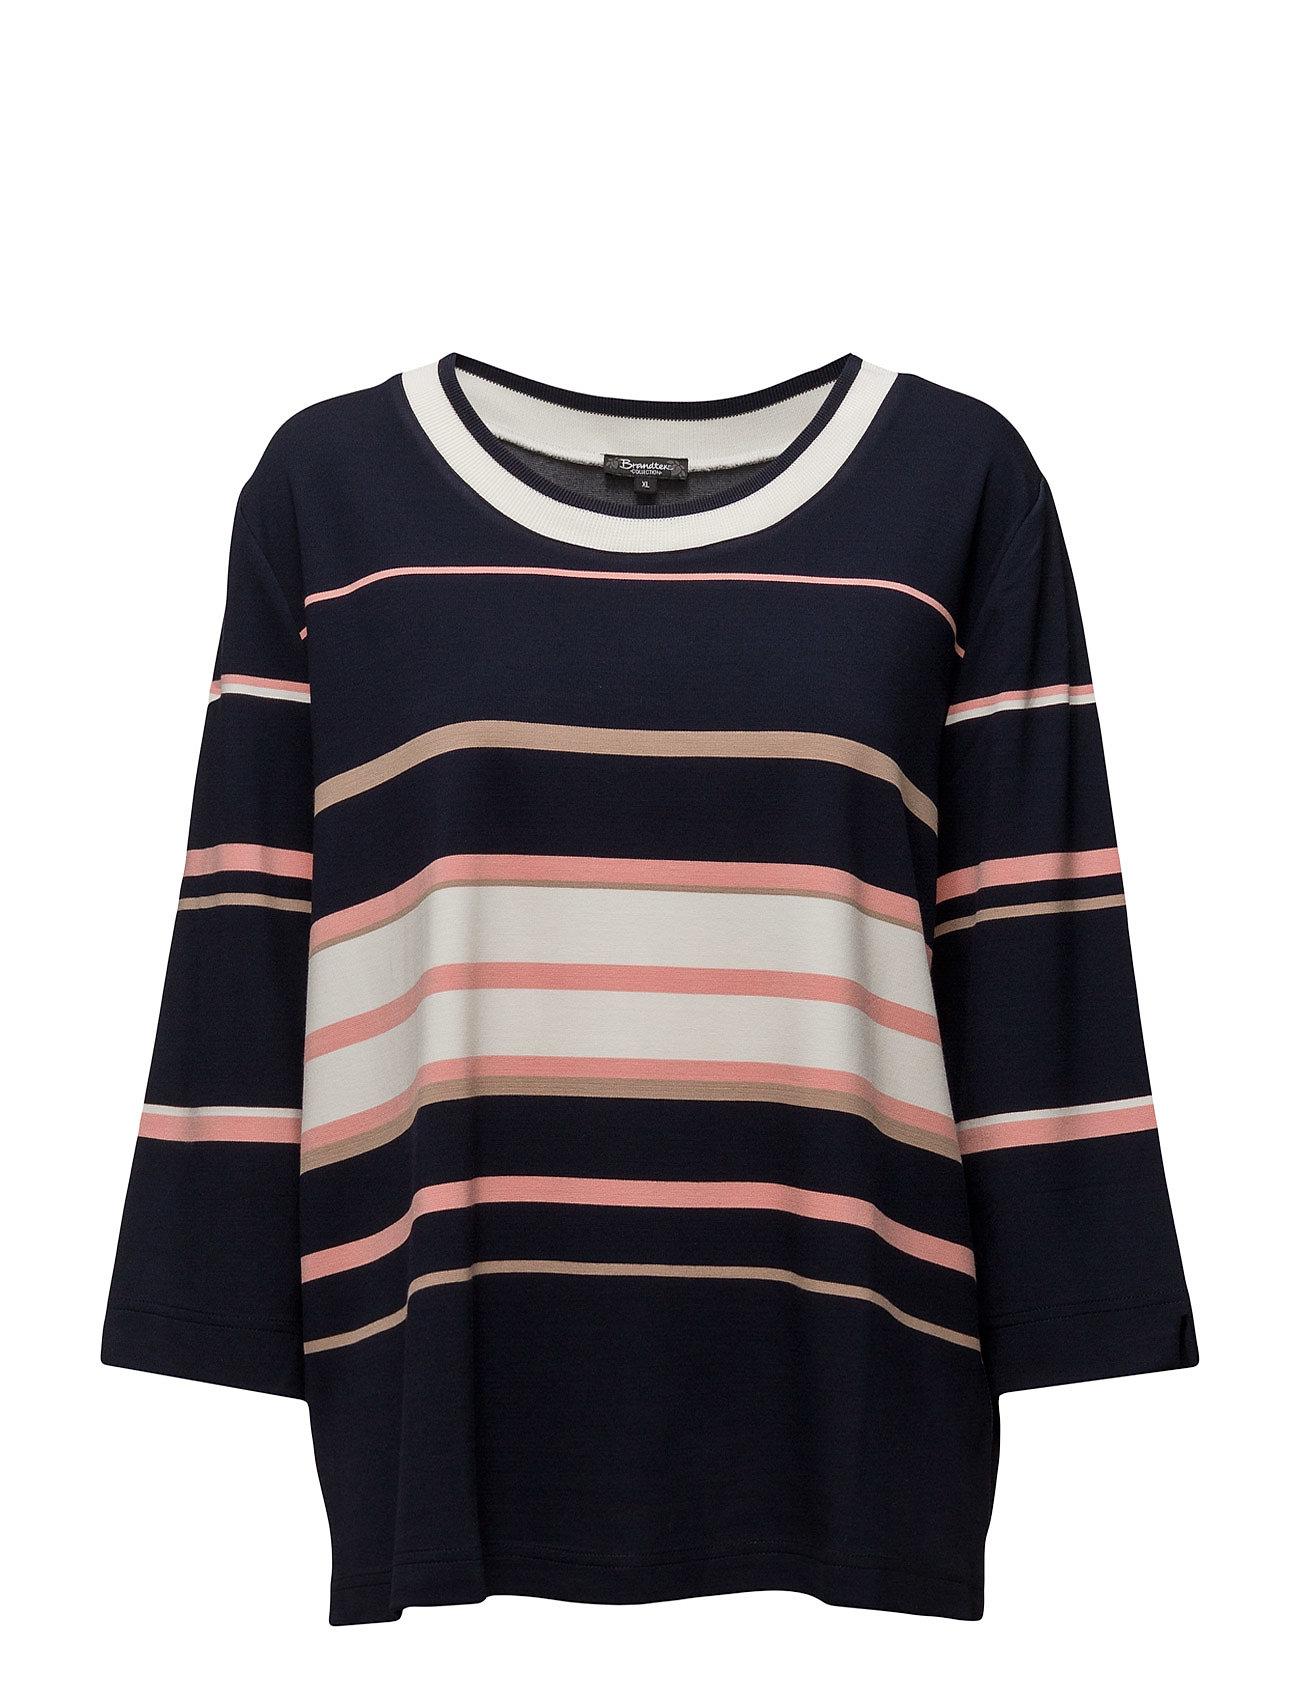 Pullover-Sweat Summer Brandtex Sweatshirts til Damer i Midnight Blue